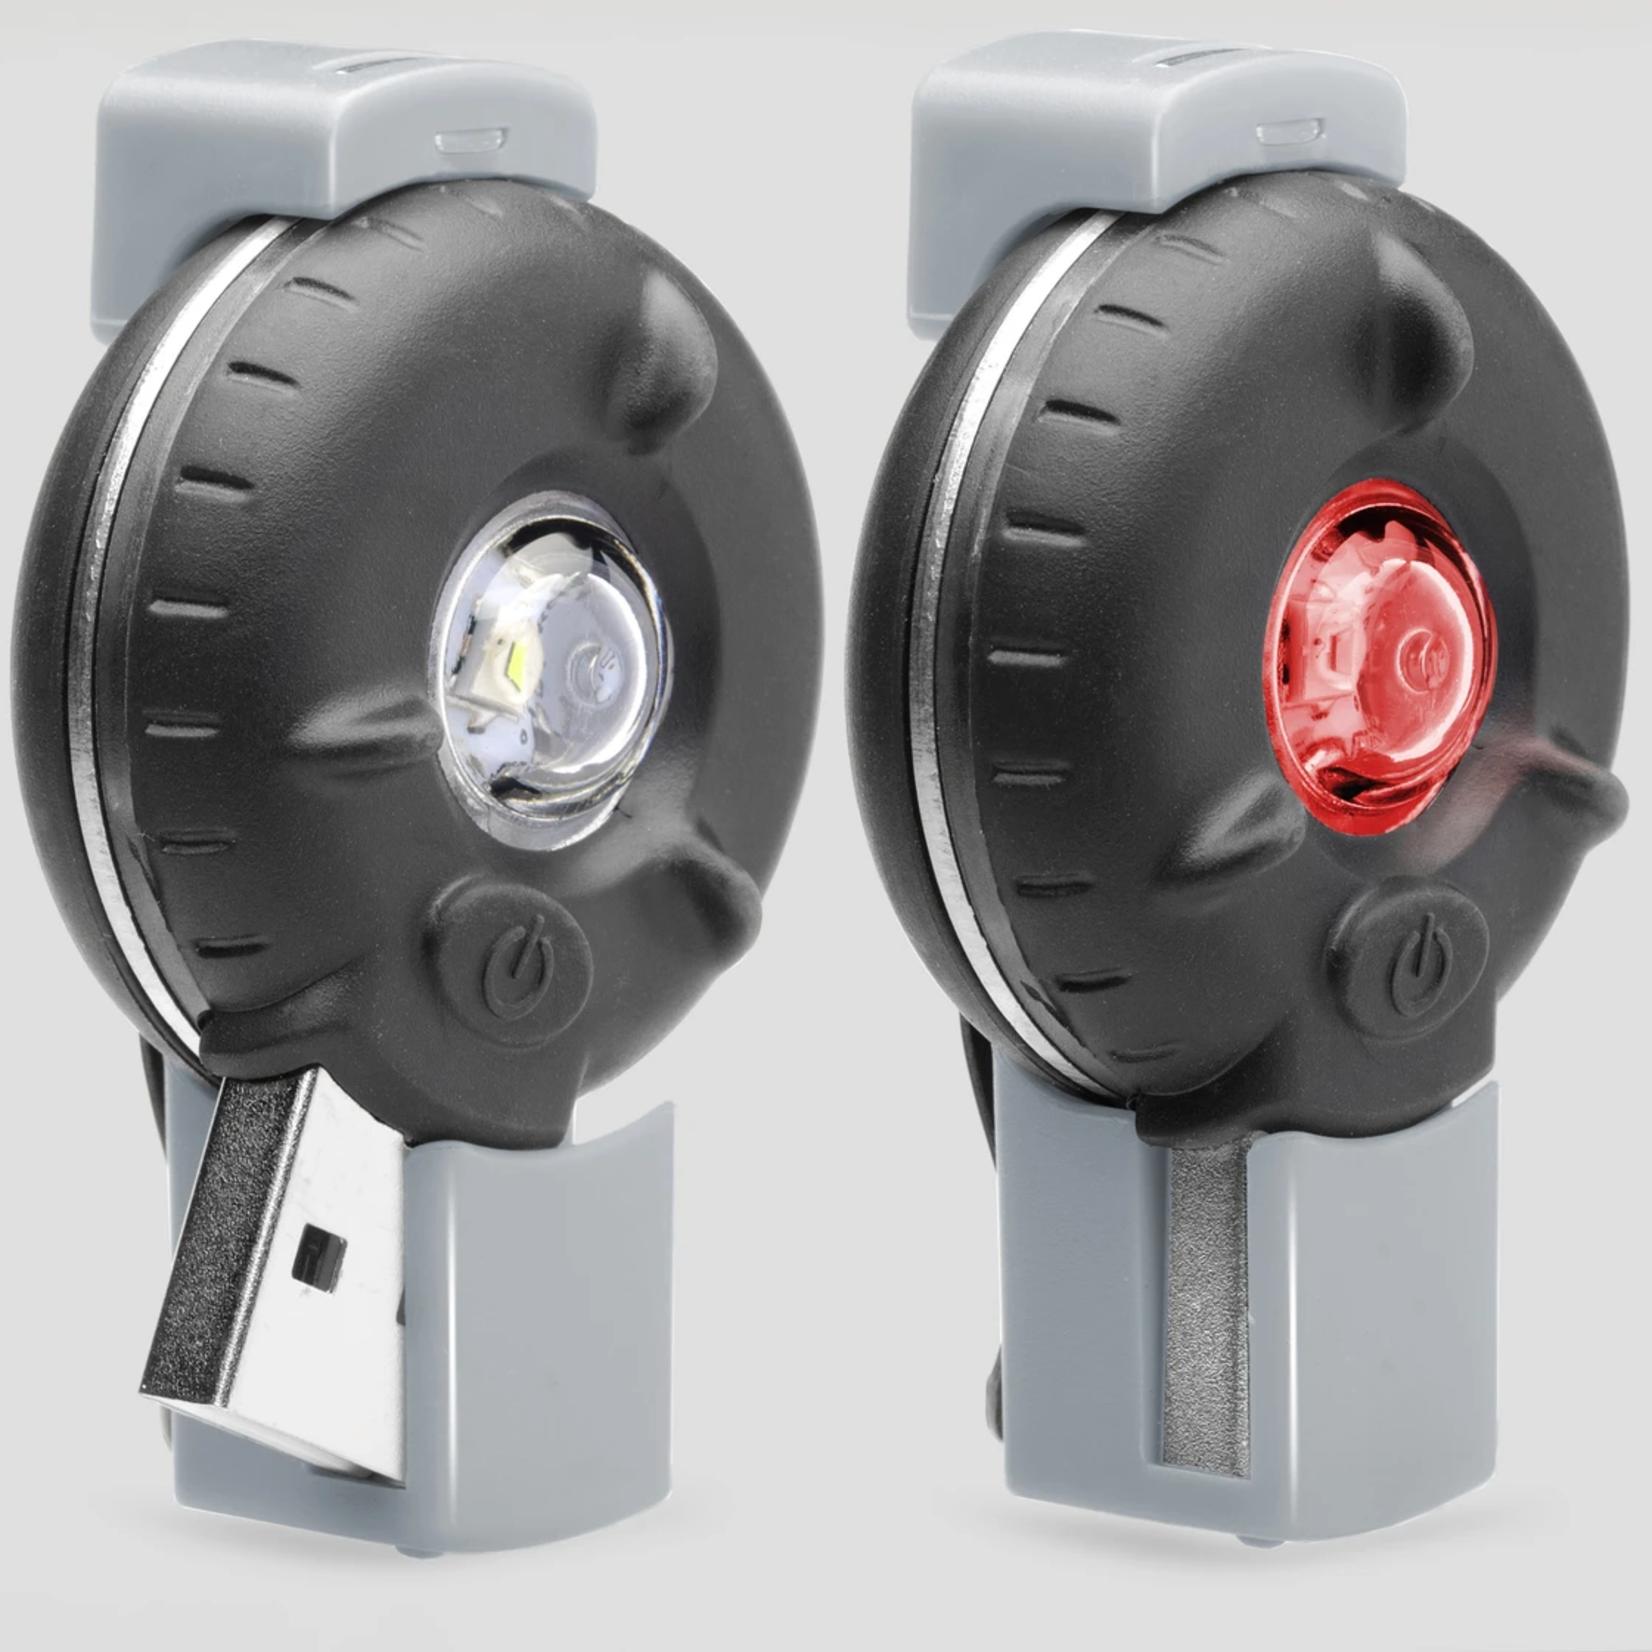 Bkin Light Set USB